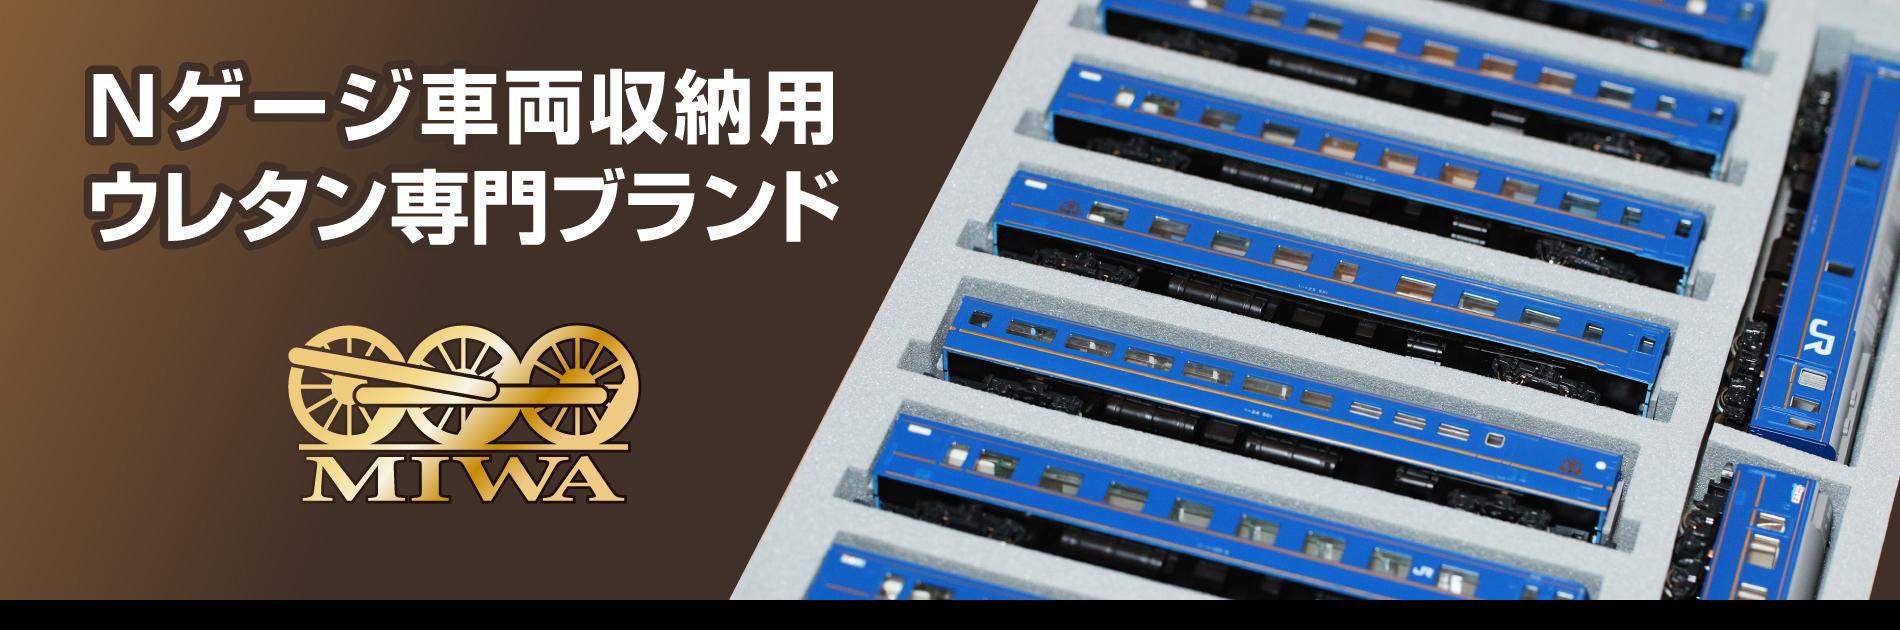 Nゲージ車両収納用(中敷)ウレタン専門ブランド MIWA